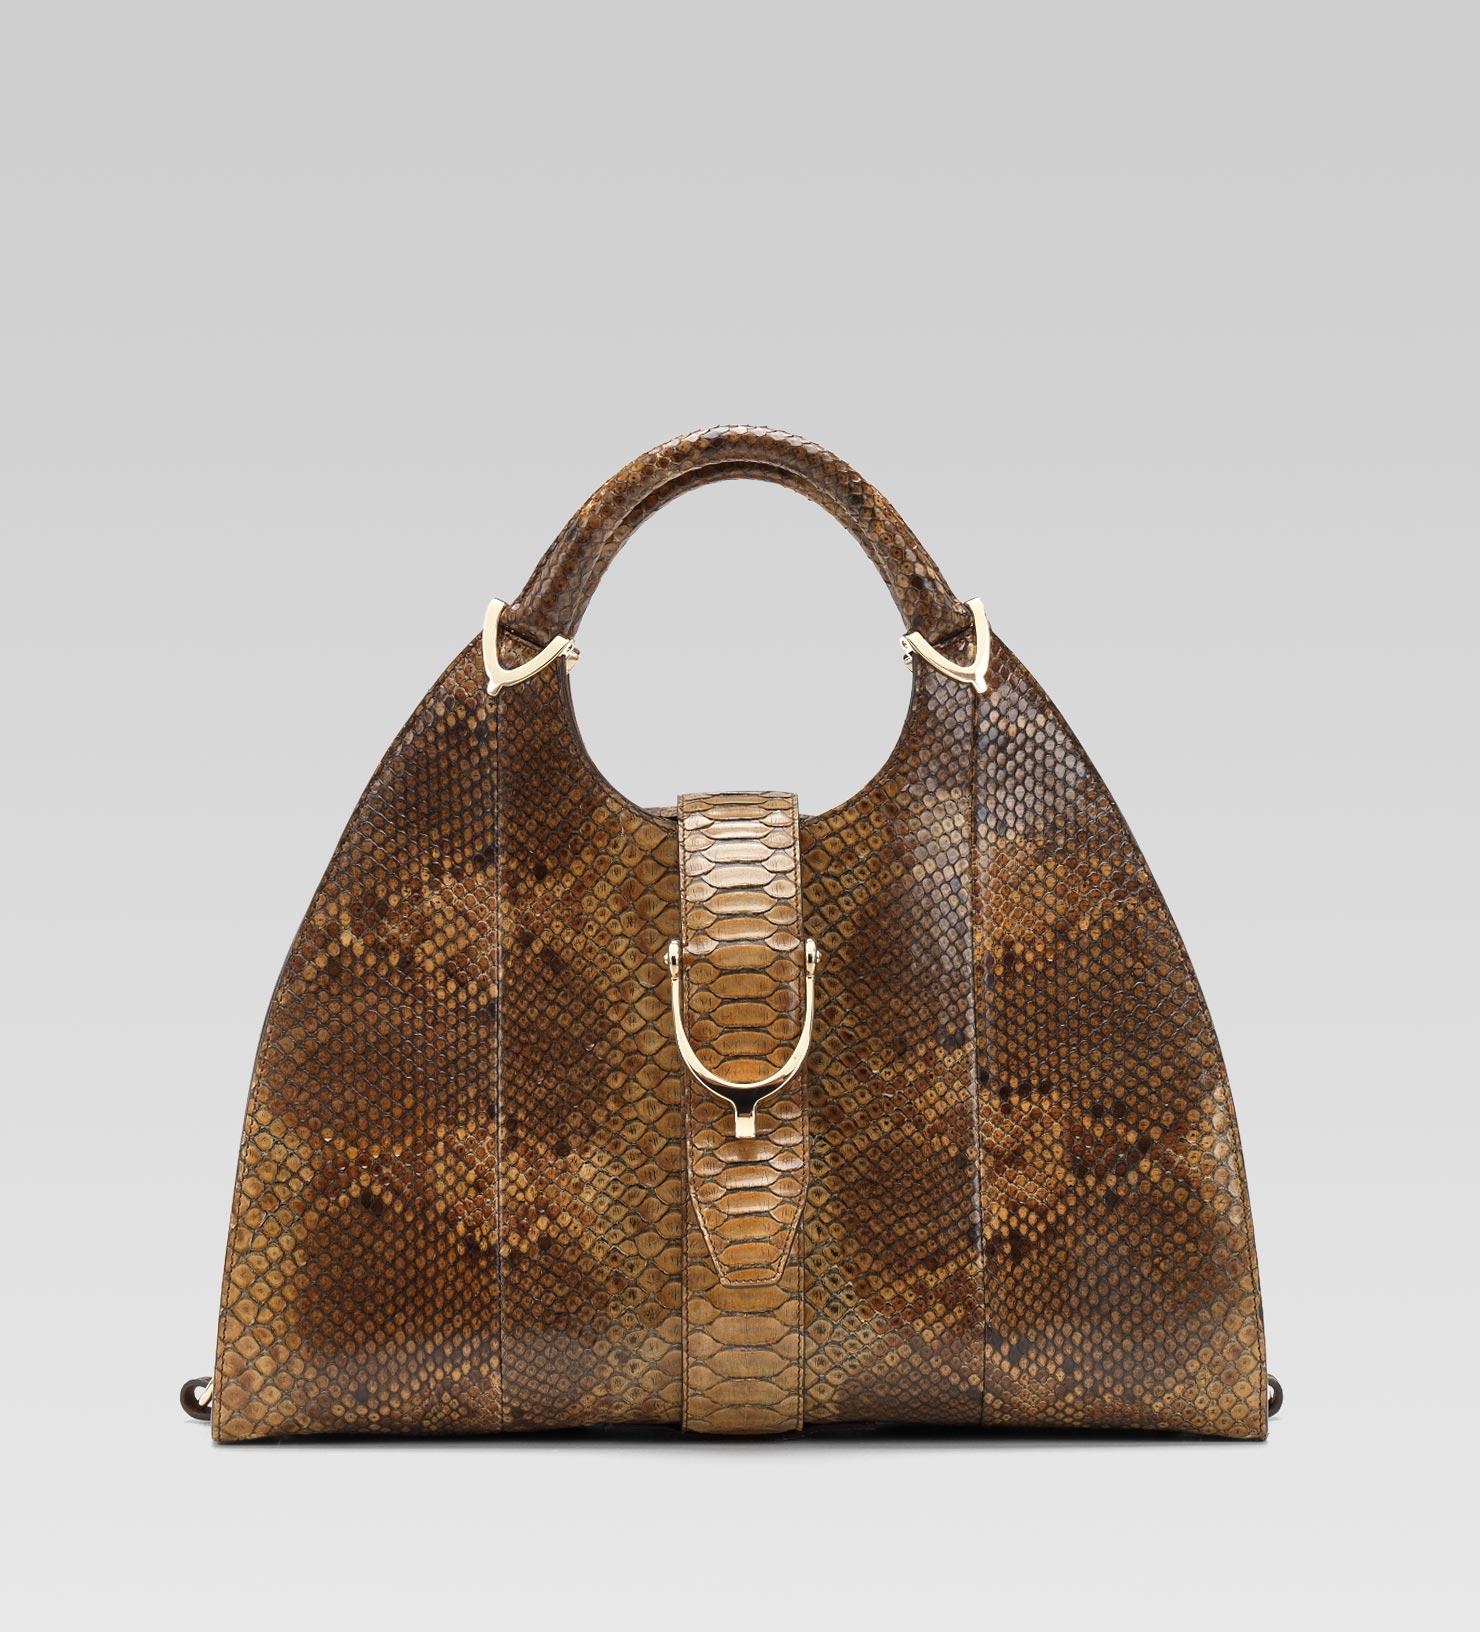 ddfe6552b08 Lyst - Gucci Stirrup Brown Python Top Handle Bag in Brown